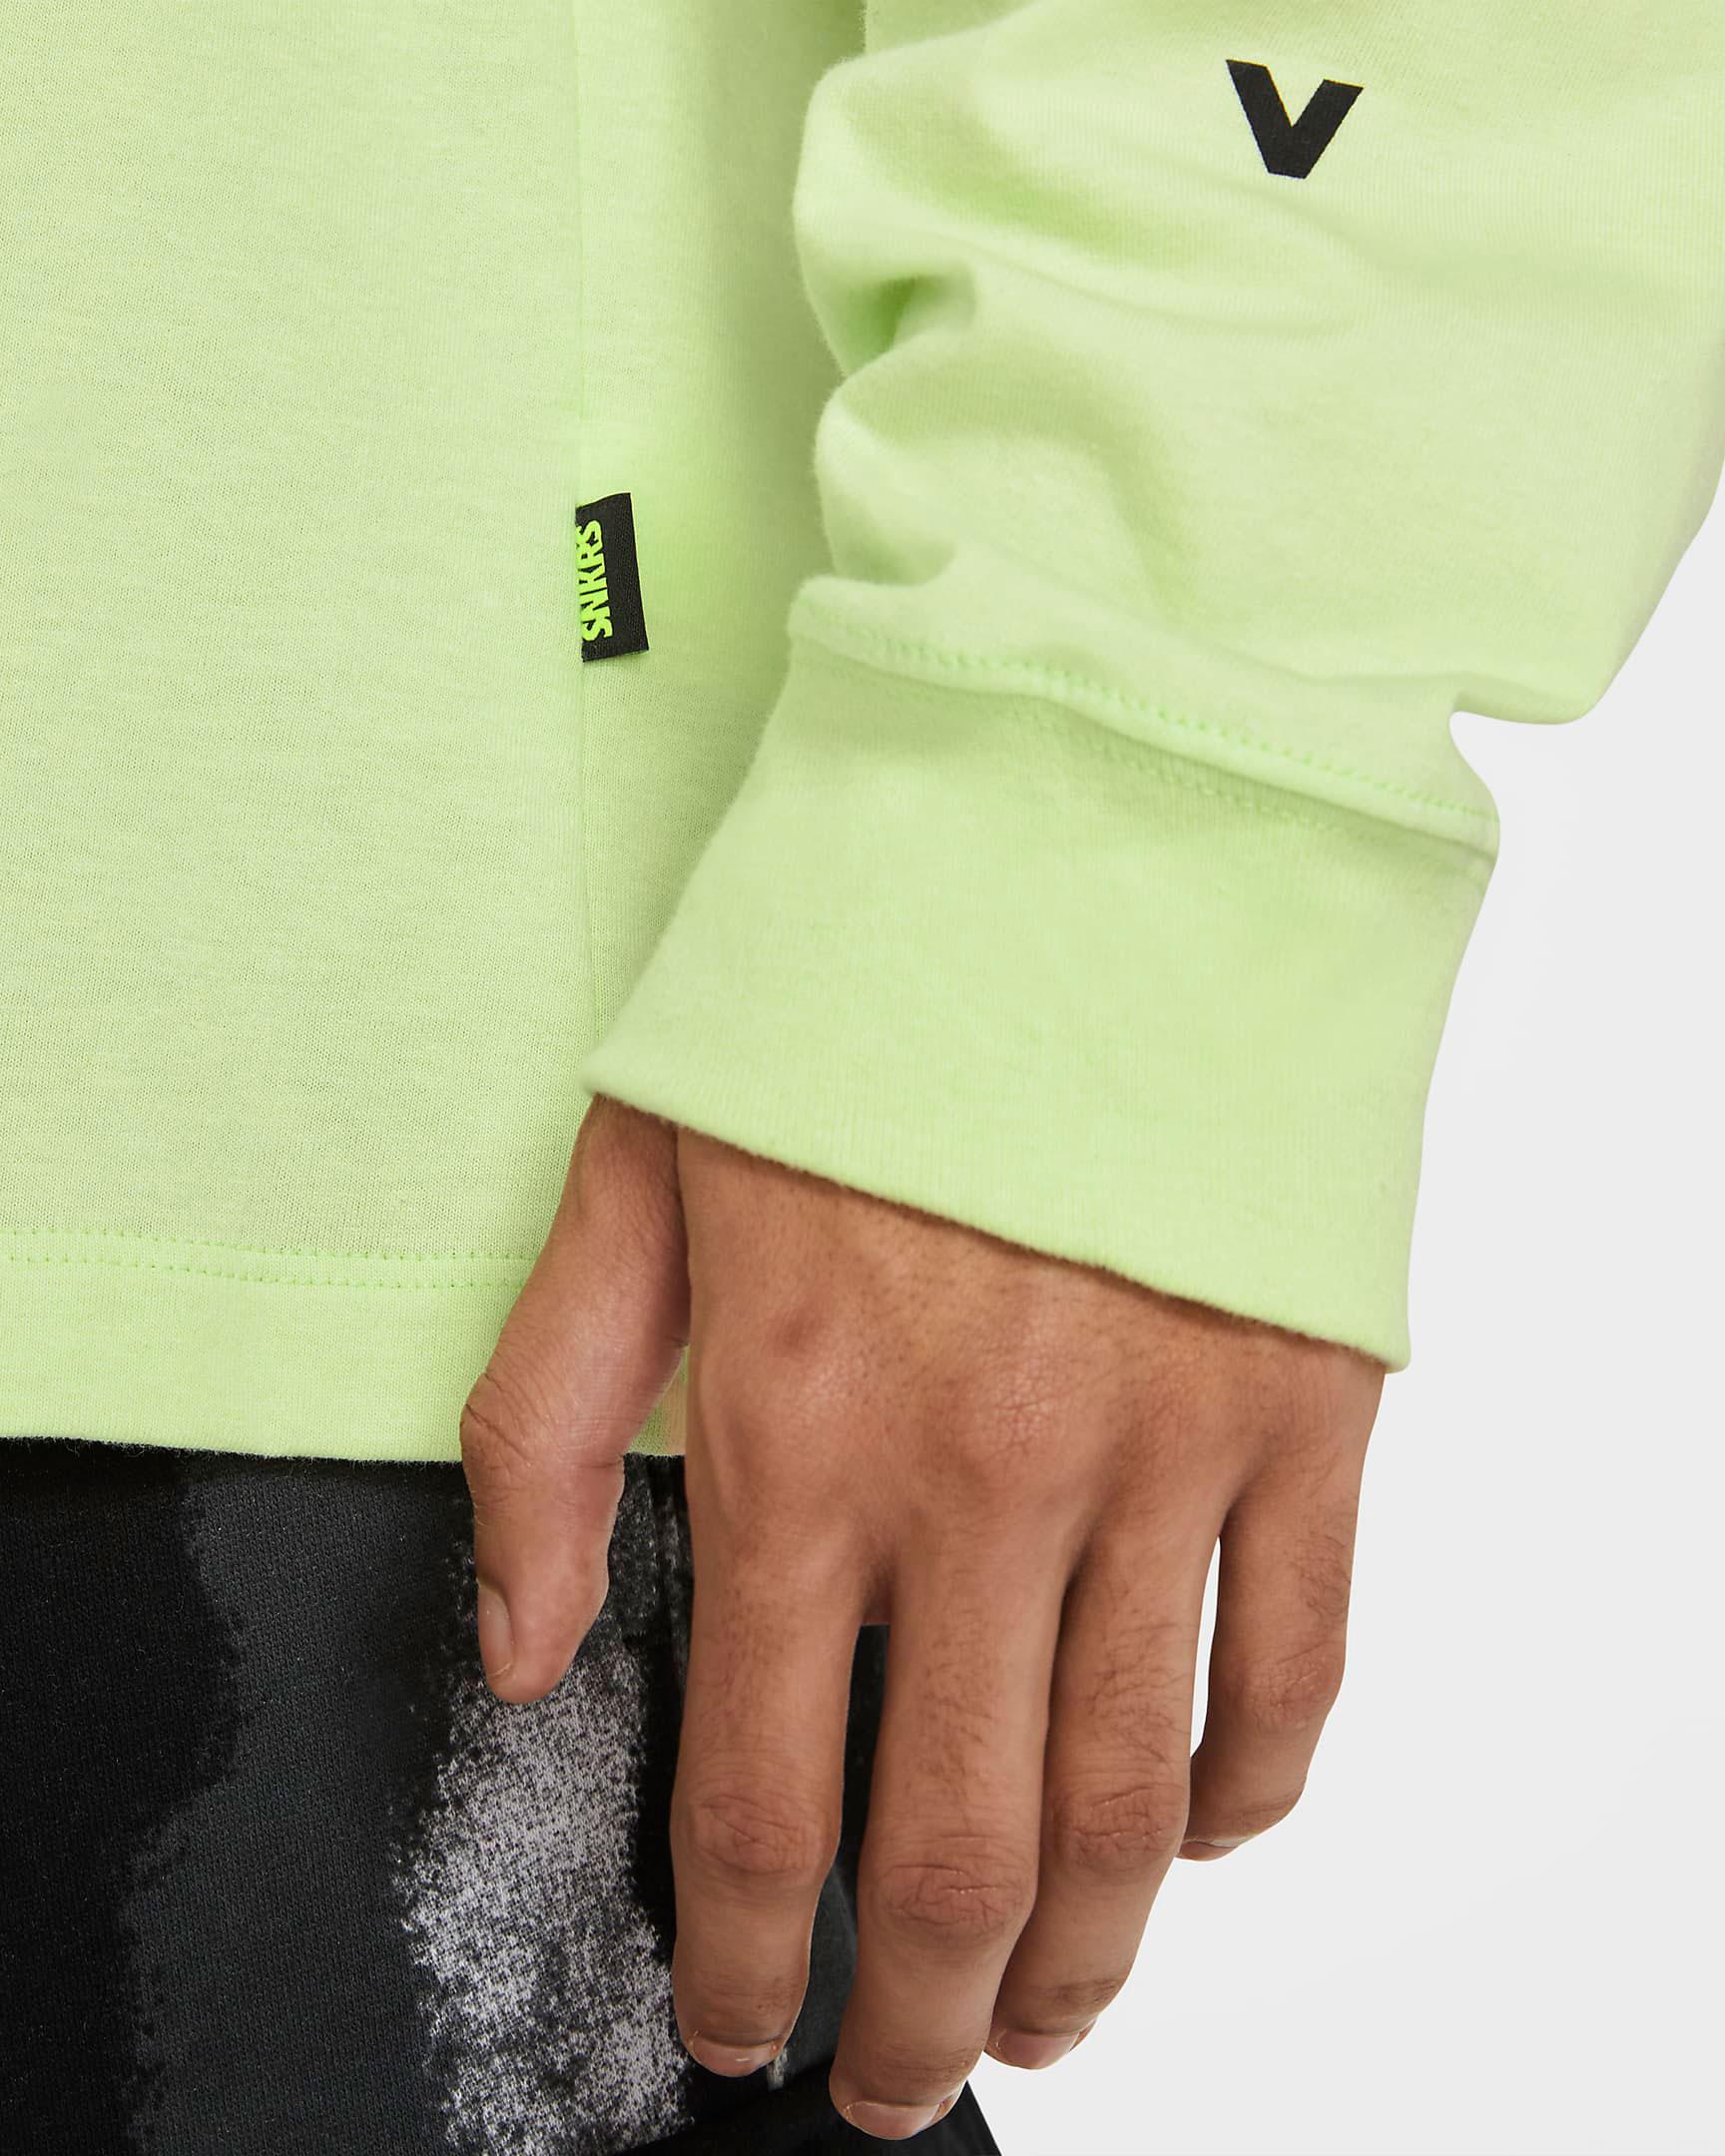 nike-air-max-95-neon-2020-long-sleeve-shirt-6